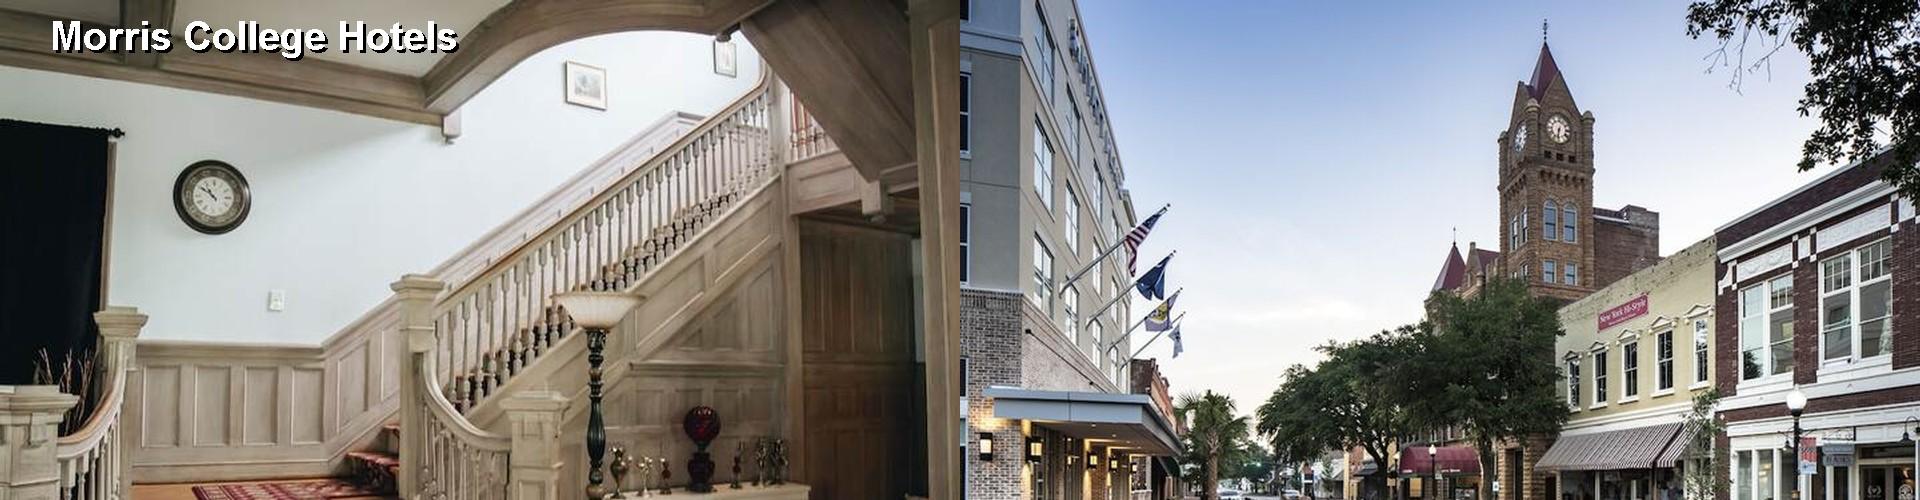 Car City Lugoff Sc >> $45+ Hotels Near Morris College in Sumter SC